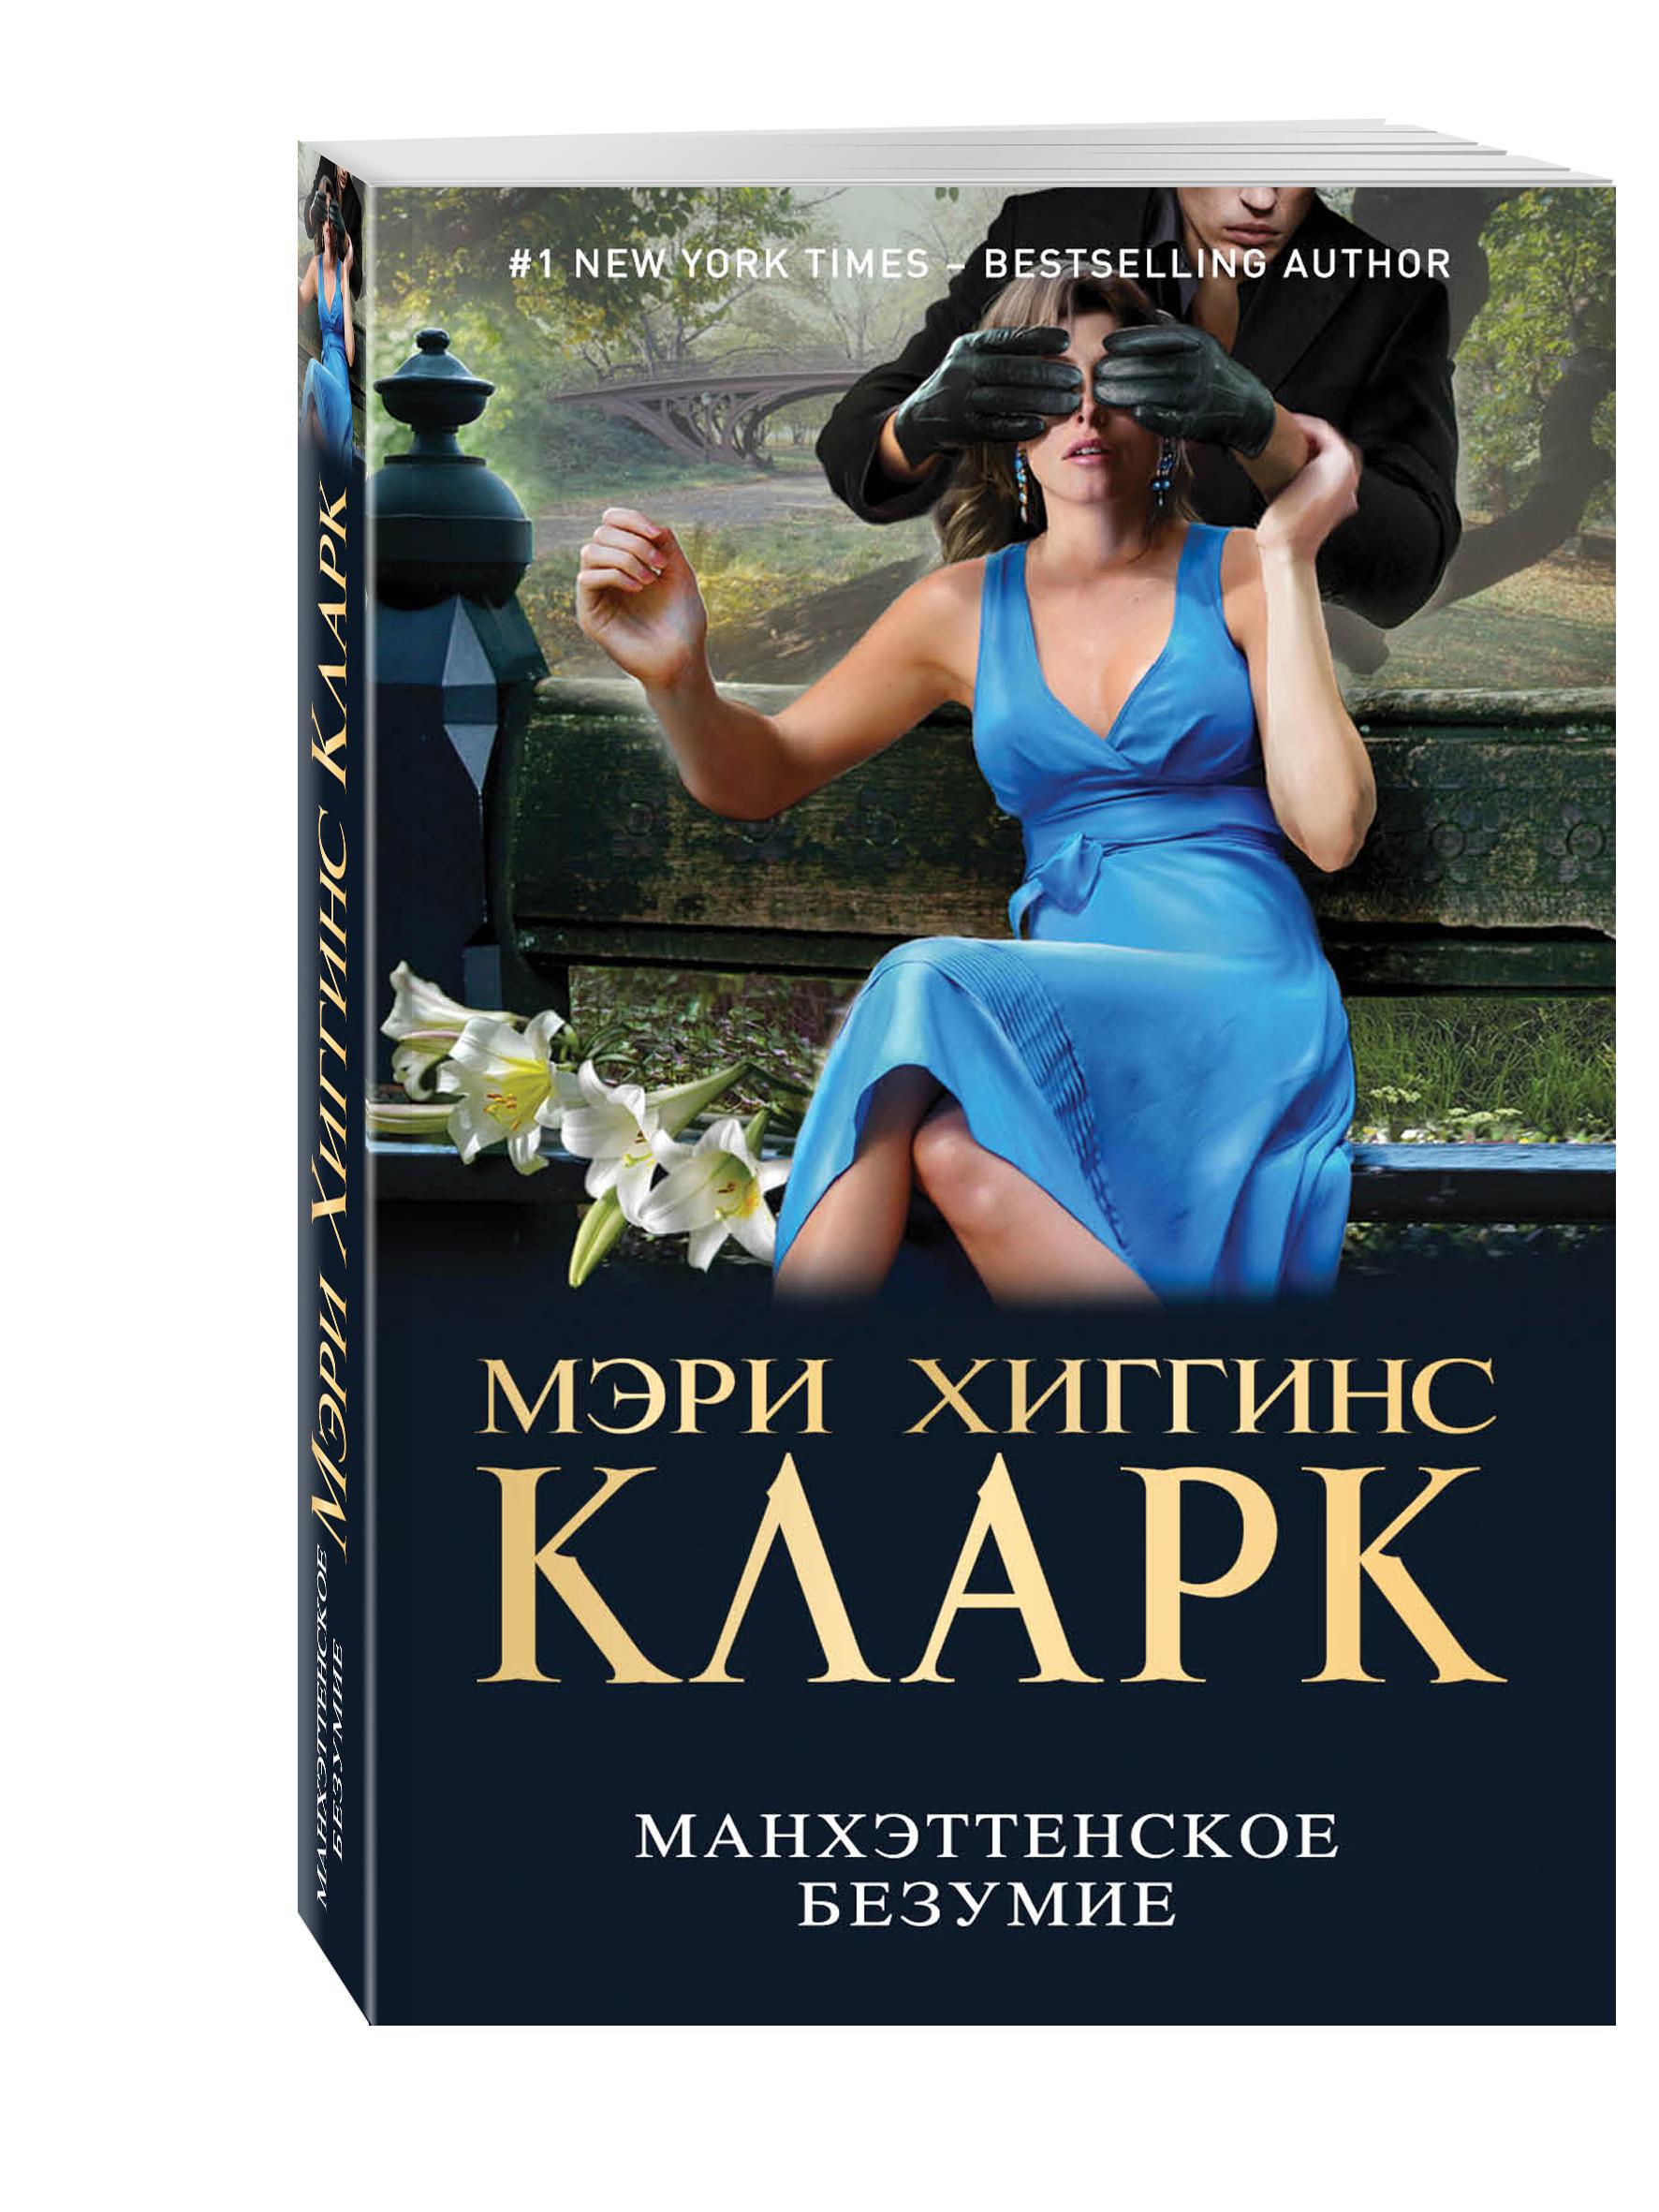 Мэри Хиггинс Кларк Манхэттенское безумие хиггинс кларк м манхэттенское безумие